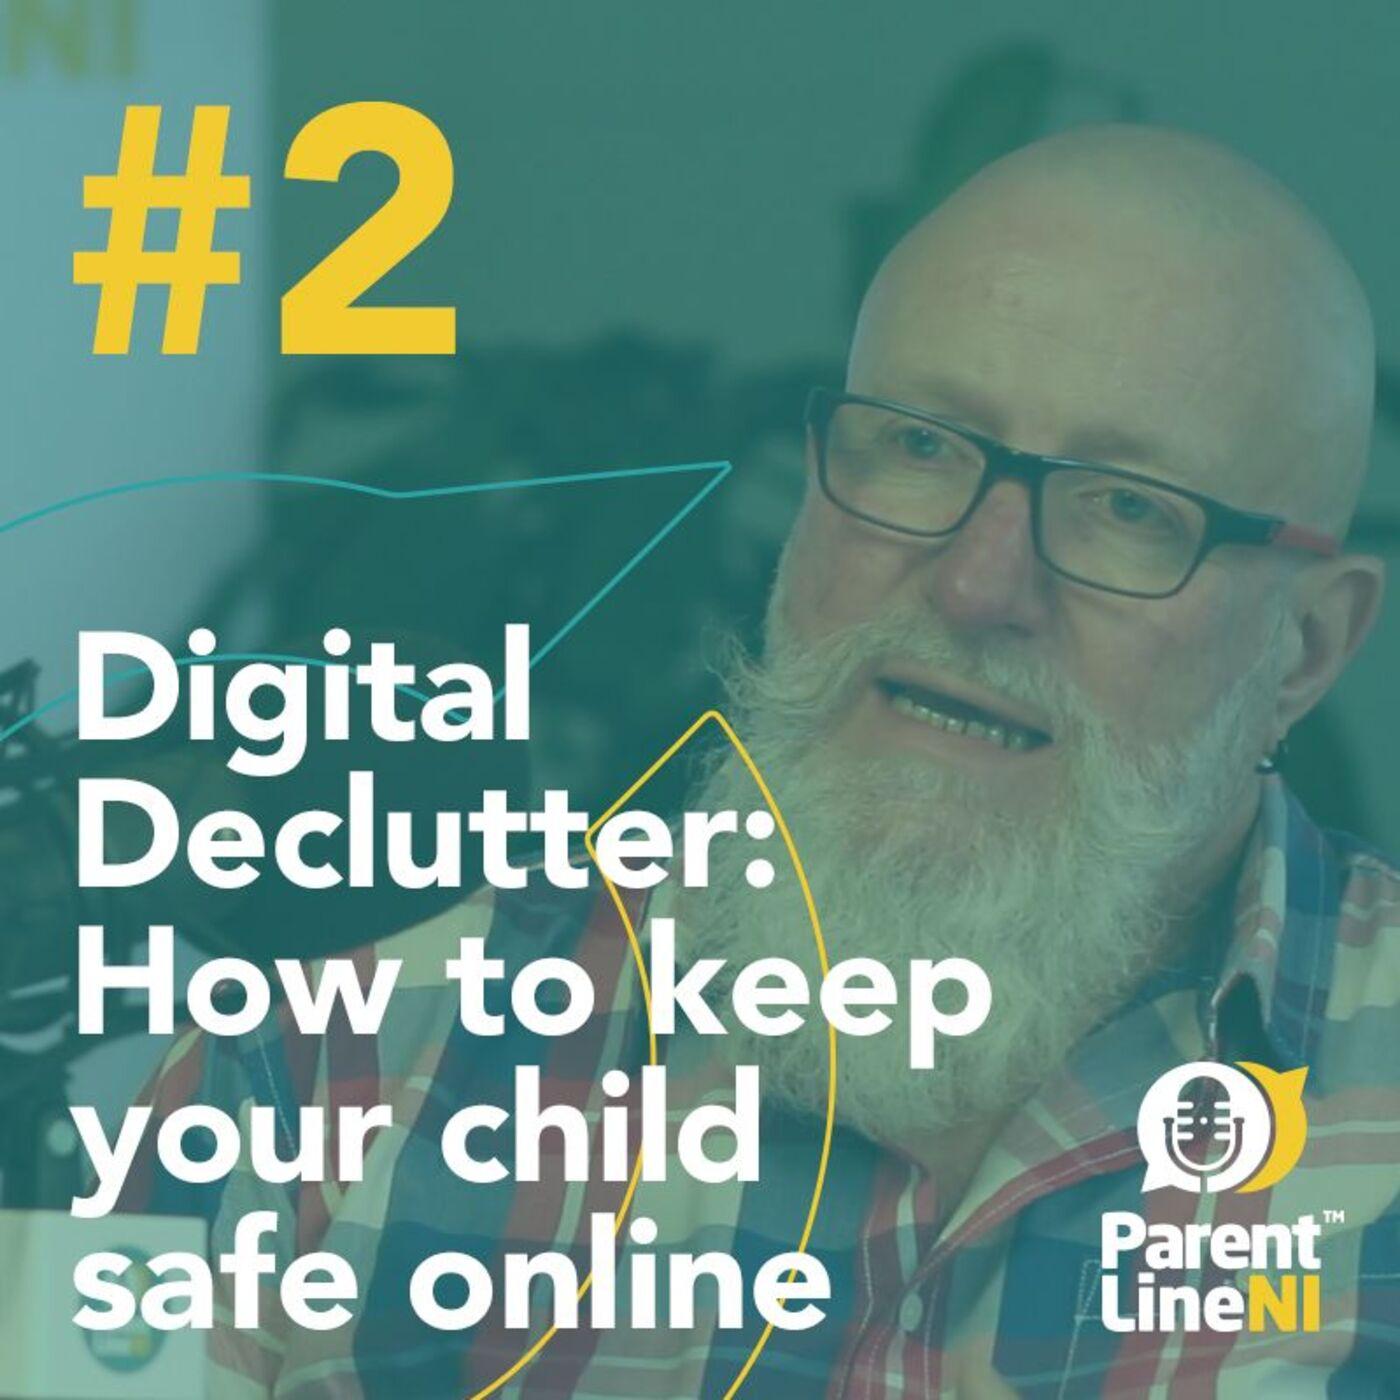 #2 Digital Declutter – How to keep your child safe online